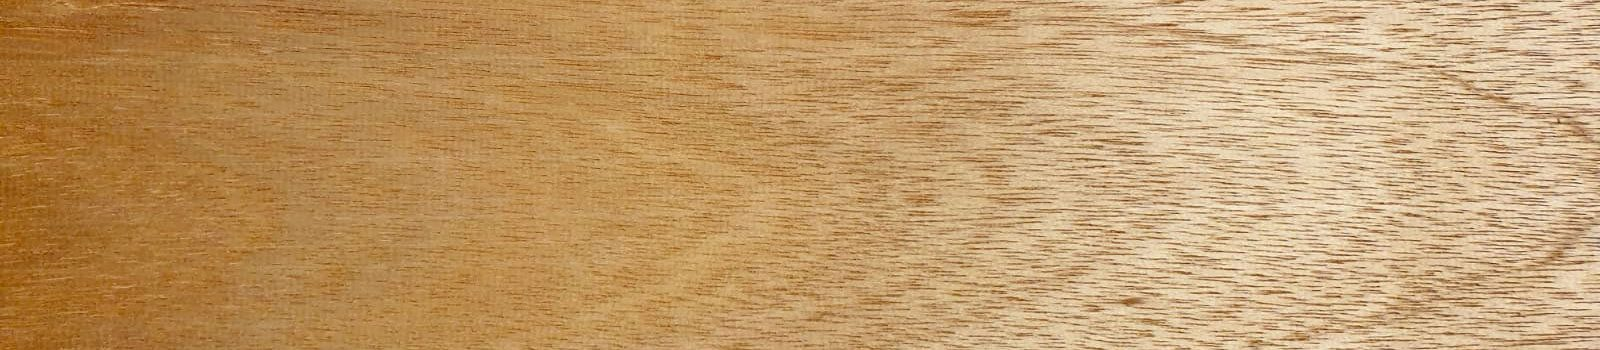 Meranti timber